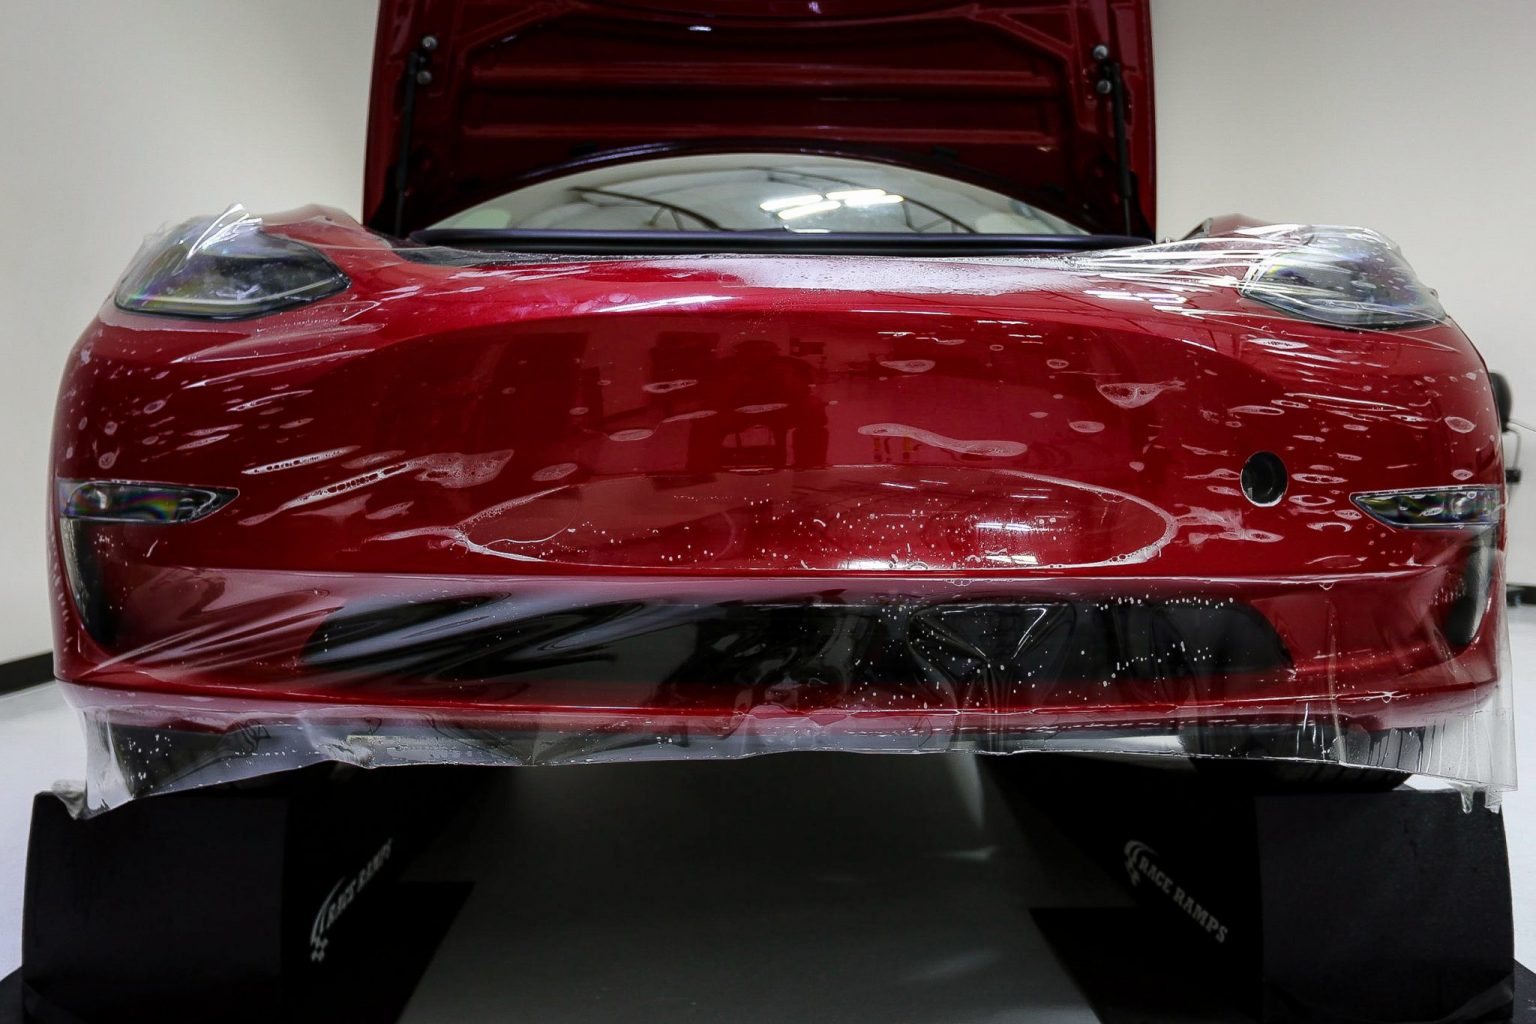 Automotive Paint Protection Films in San Antonio, Texas